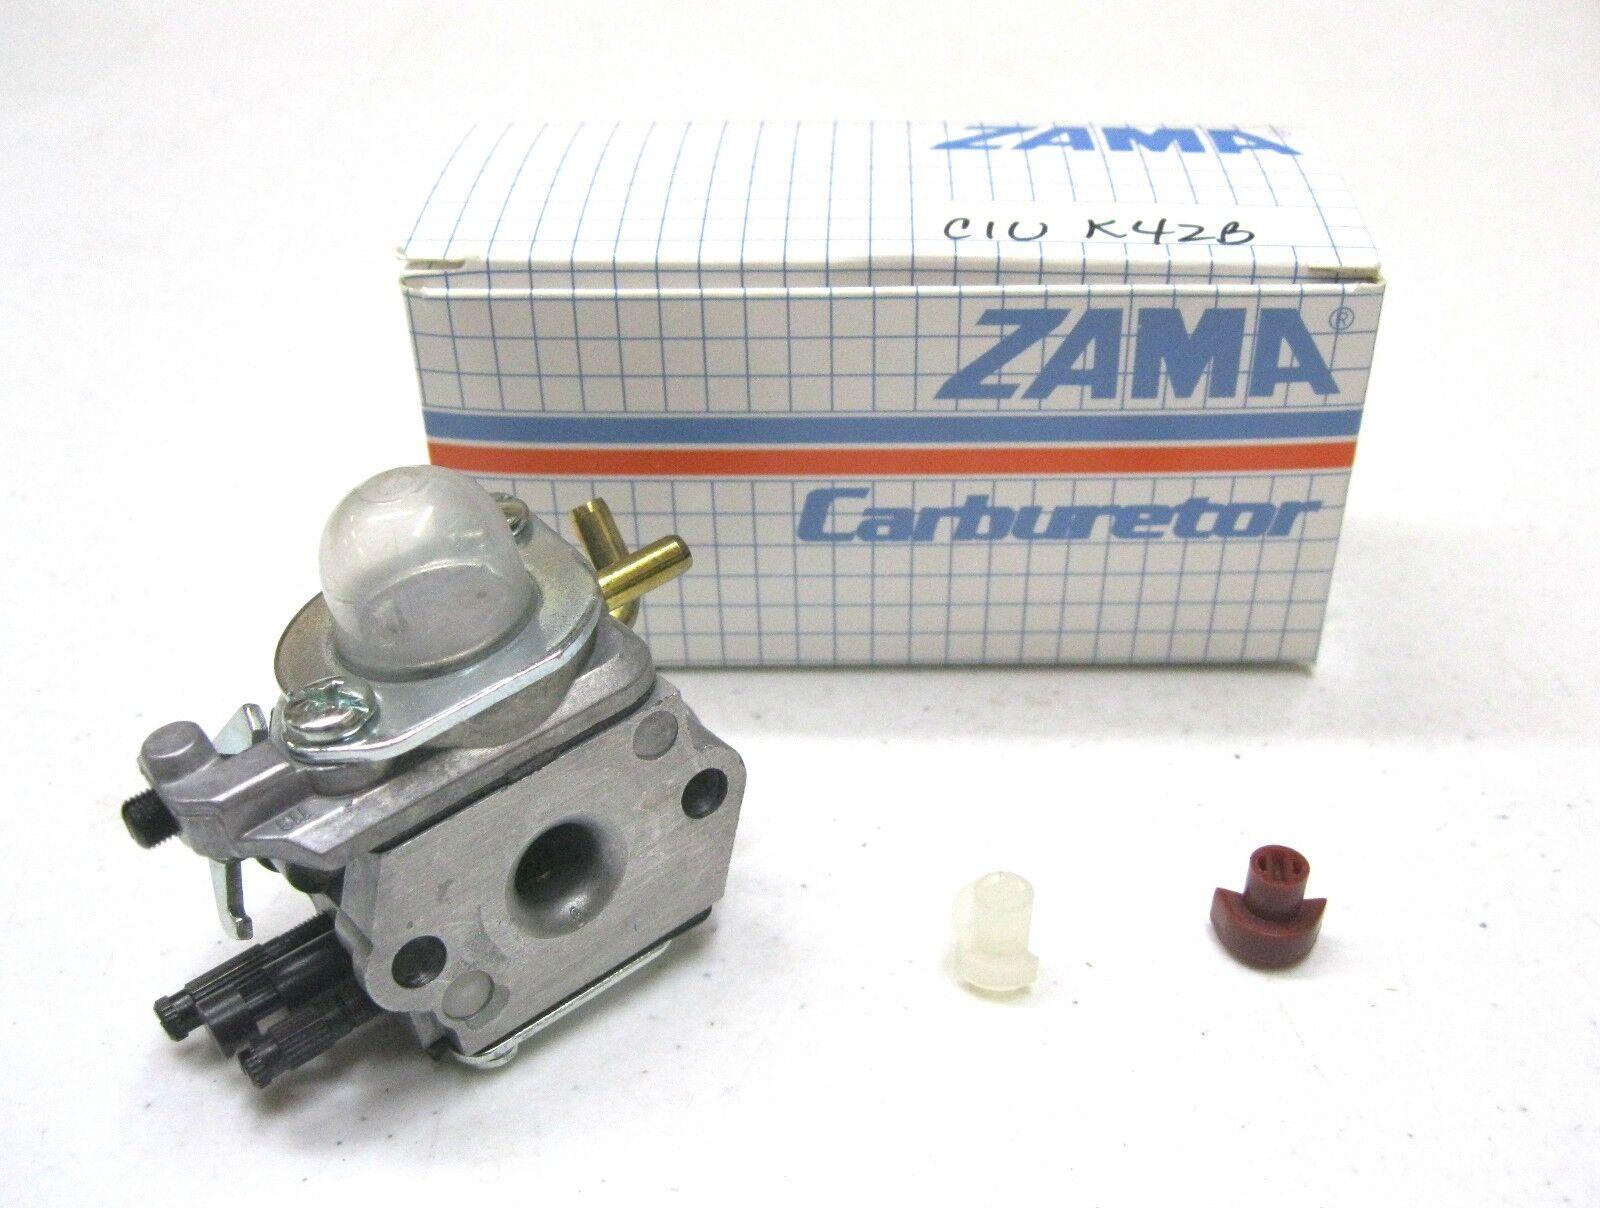 PB2100 Blower Rotary 11175 Carburetor Carb for ZAMA C1U-K42B Echo PB1000 PB200